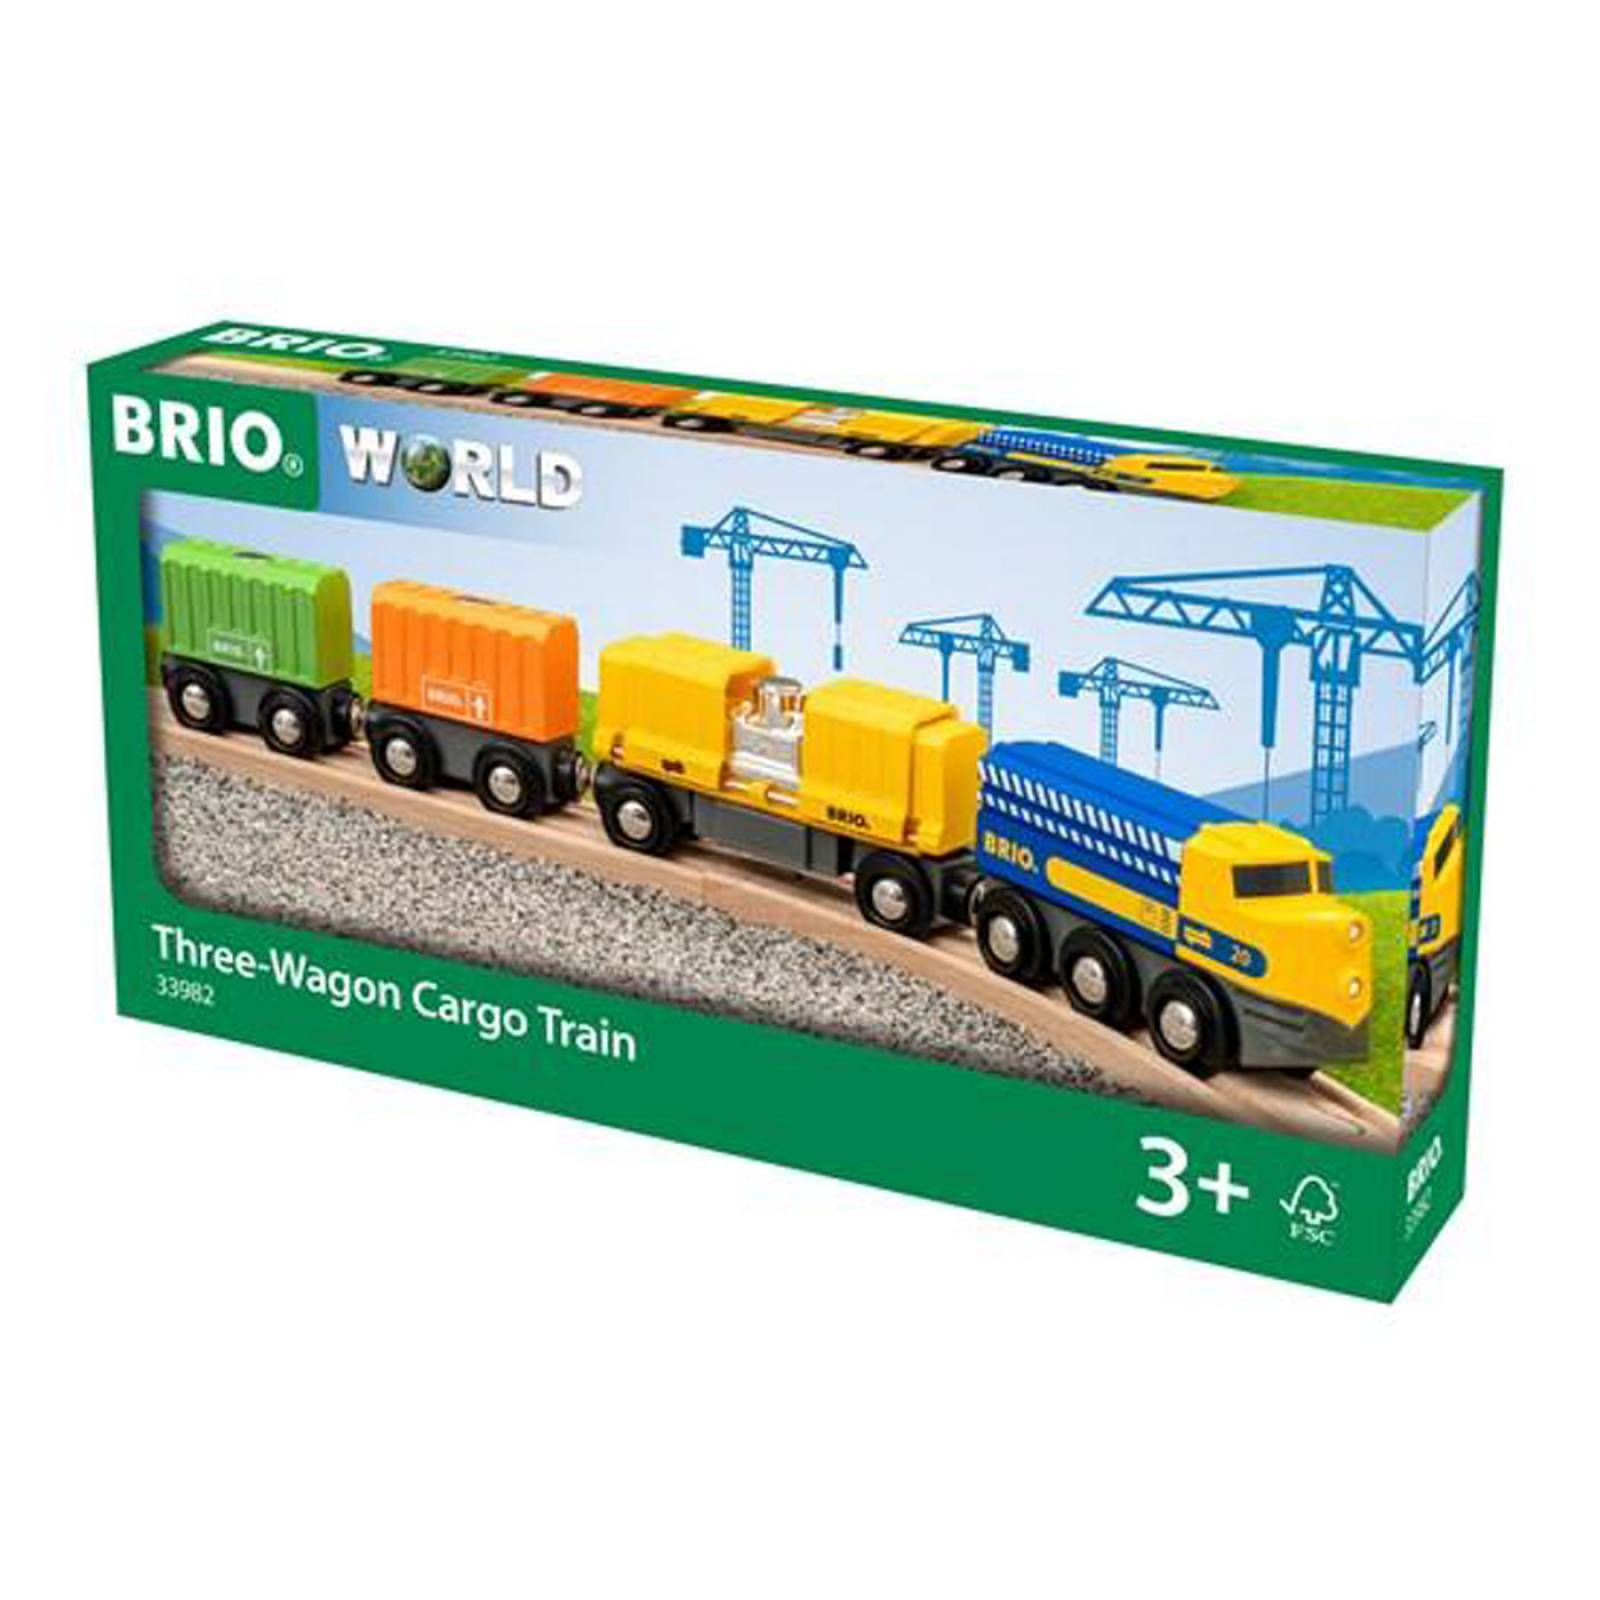 Three-Wagon Cargo Train BRIO Wooden Railway Age 3+